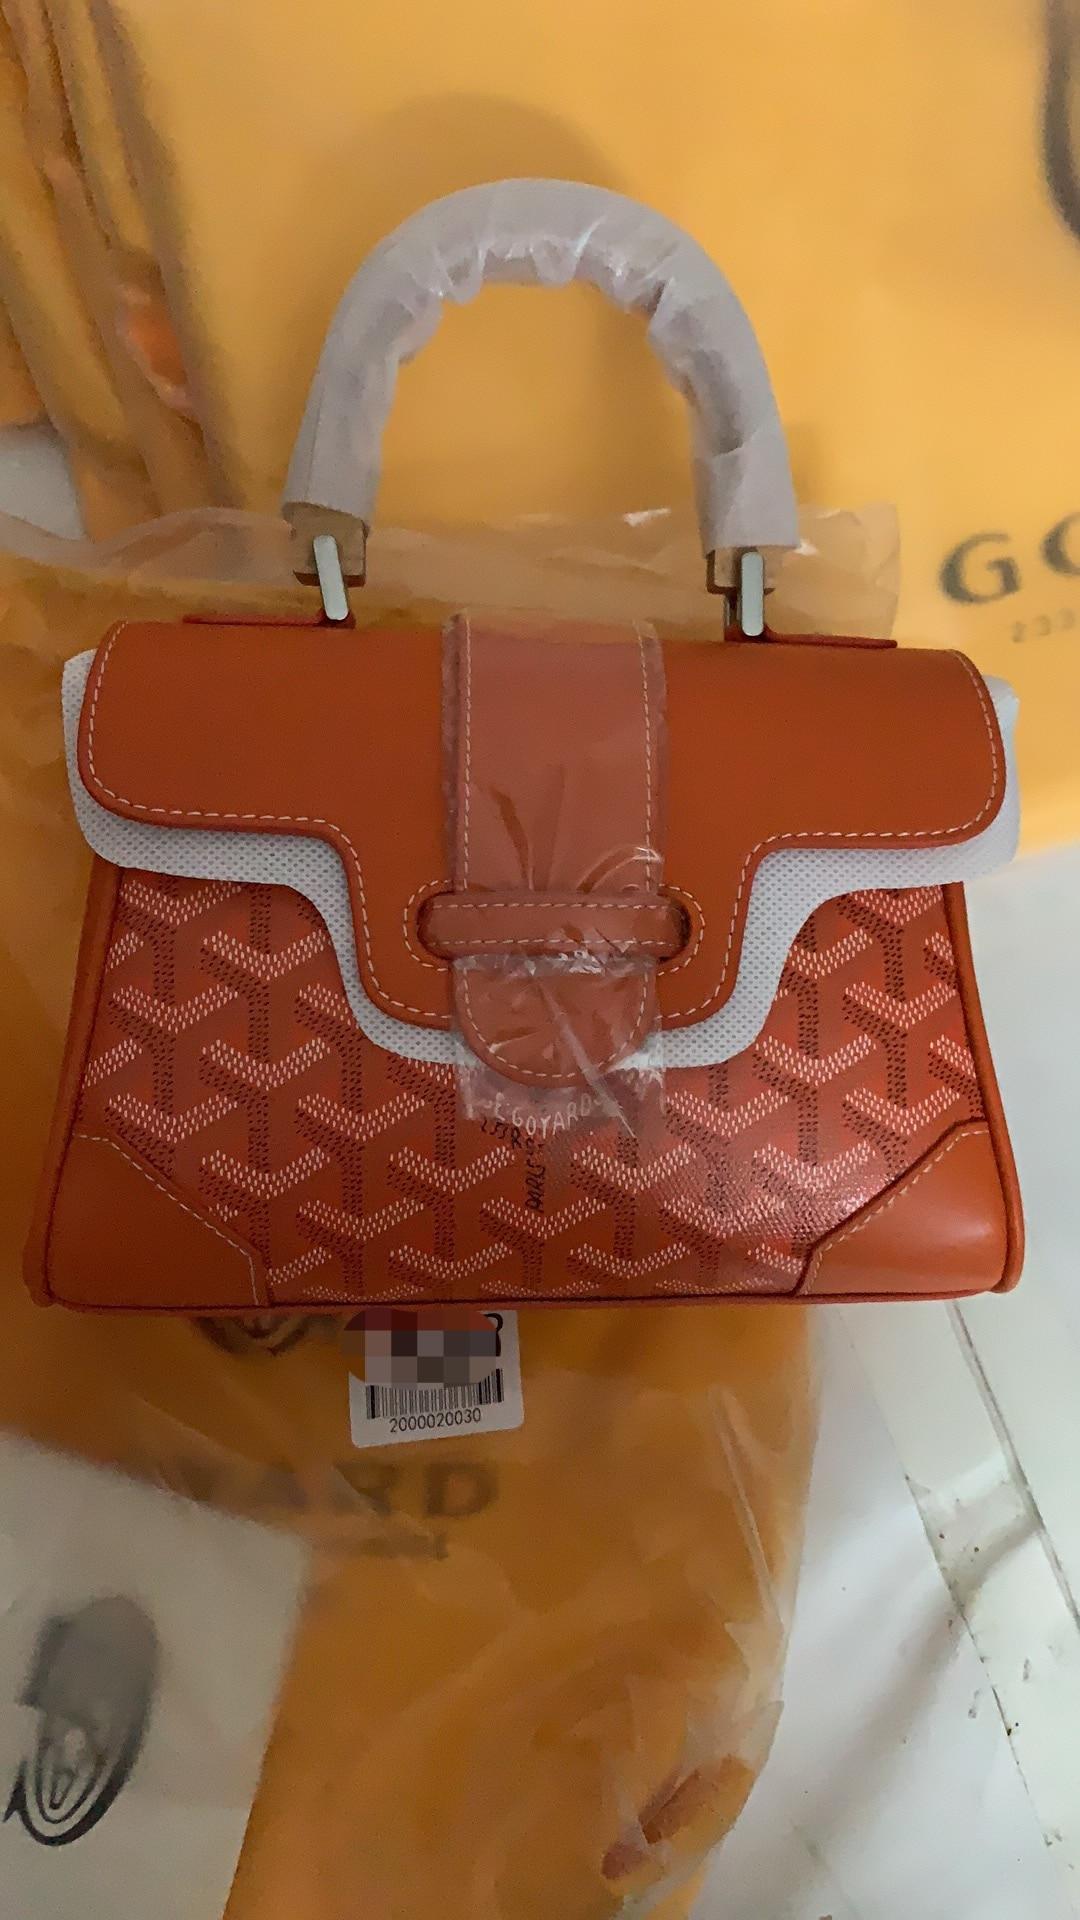 Goya-goياردة نمط Saigon حقيبة يد خشبية عقد حقيبة كيلي صغيرة واحدة الكتف حقيبة يد كروس مطبوعة حقيبة جلدية